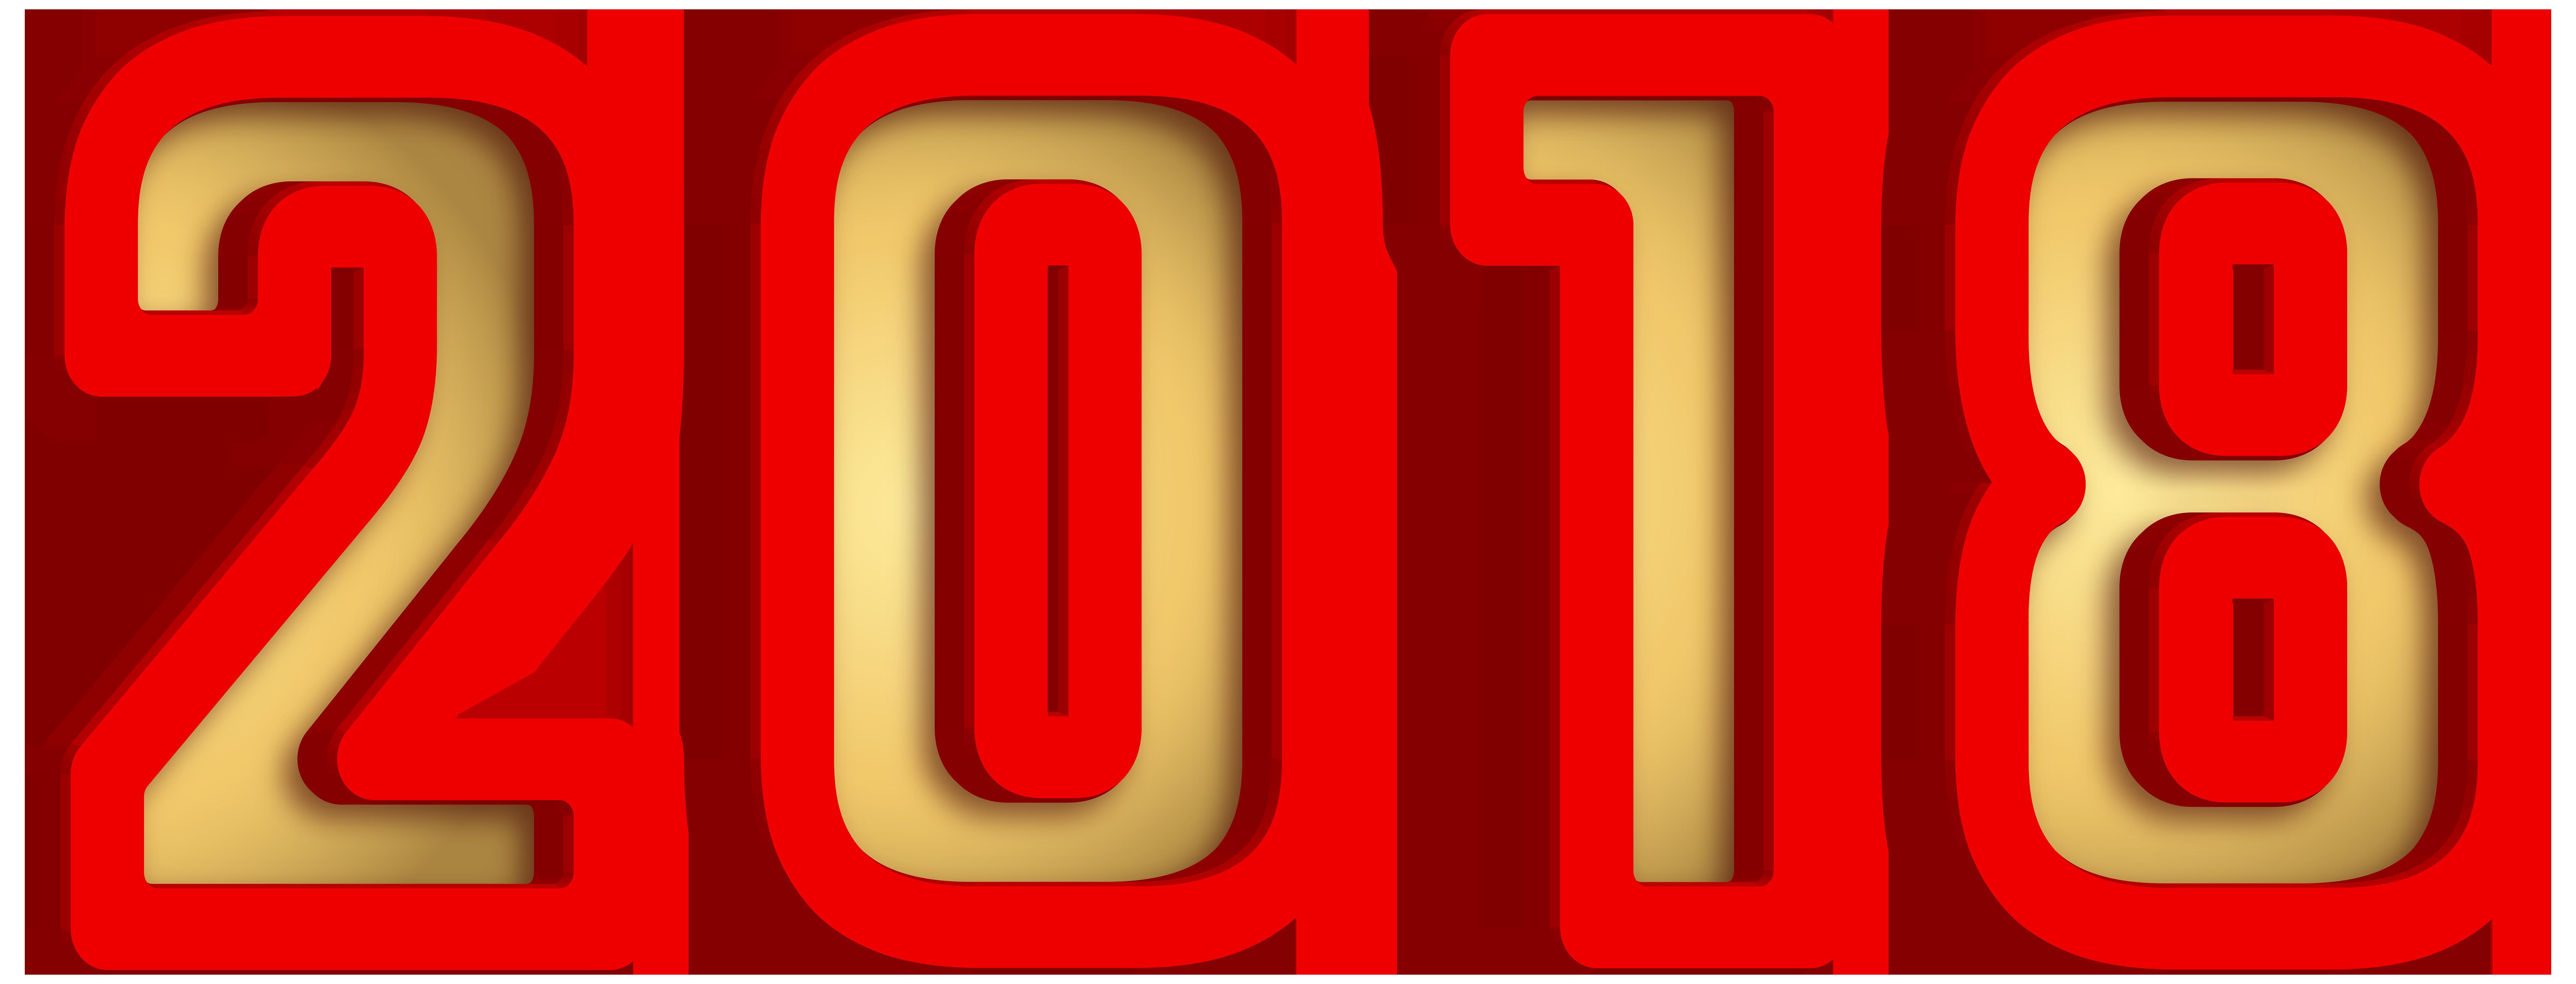 2018 Gold Red Transparent PNG Clip Art.